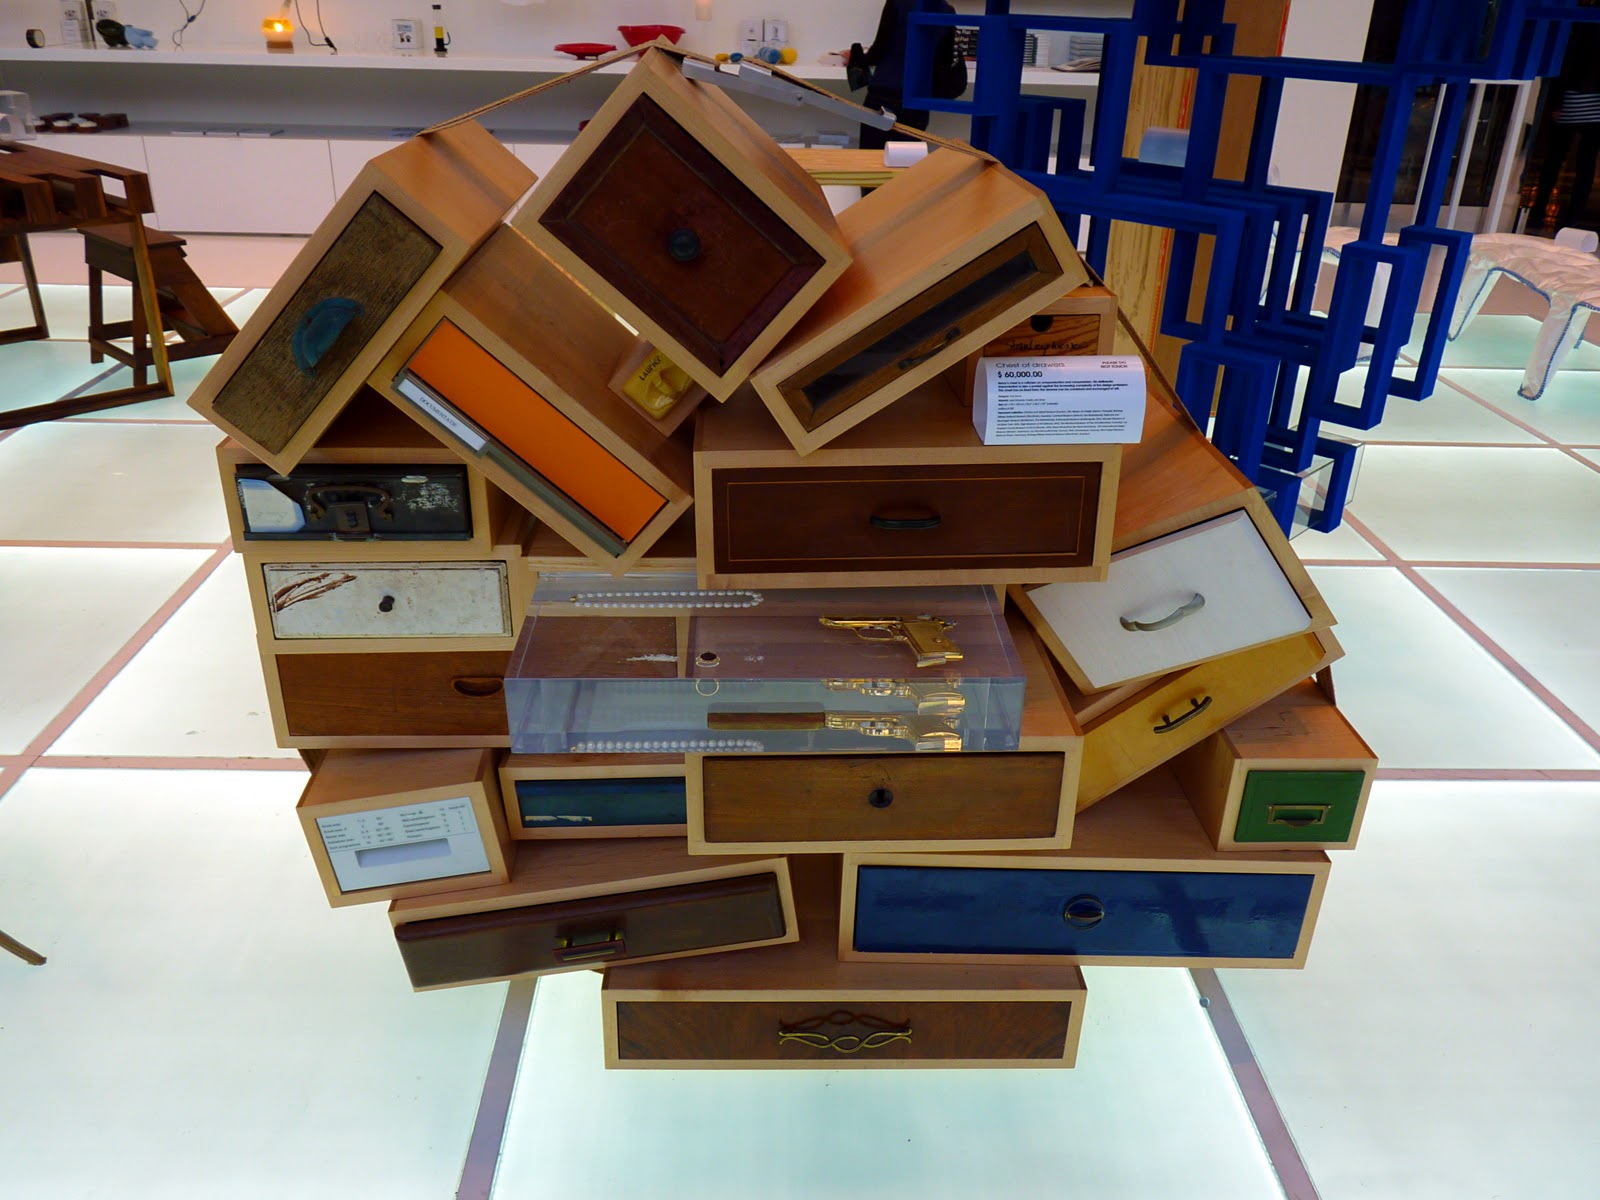 VegasImages: Unusual Furniture At Droog